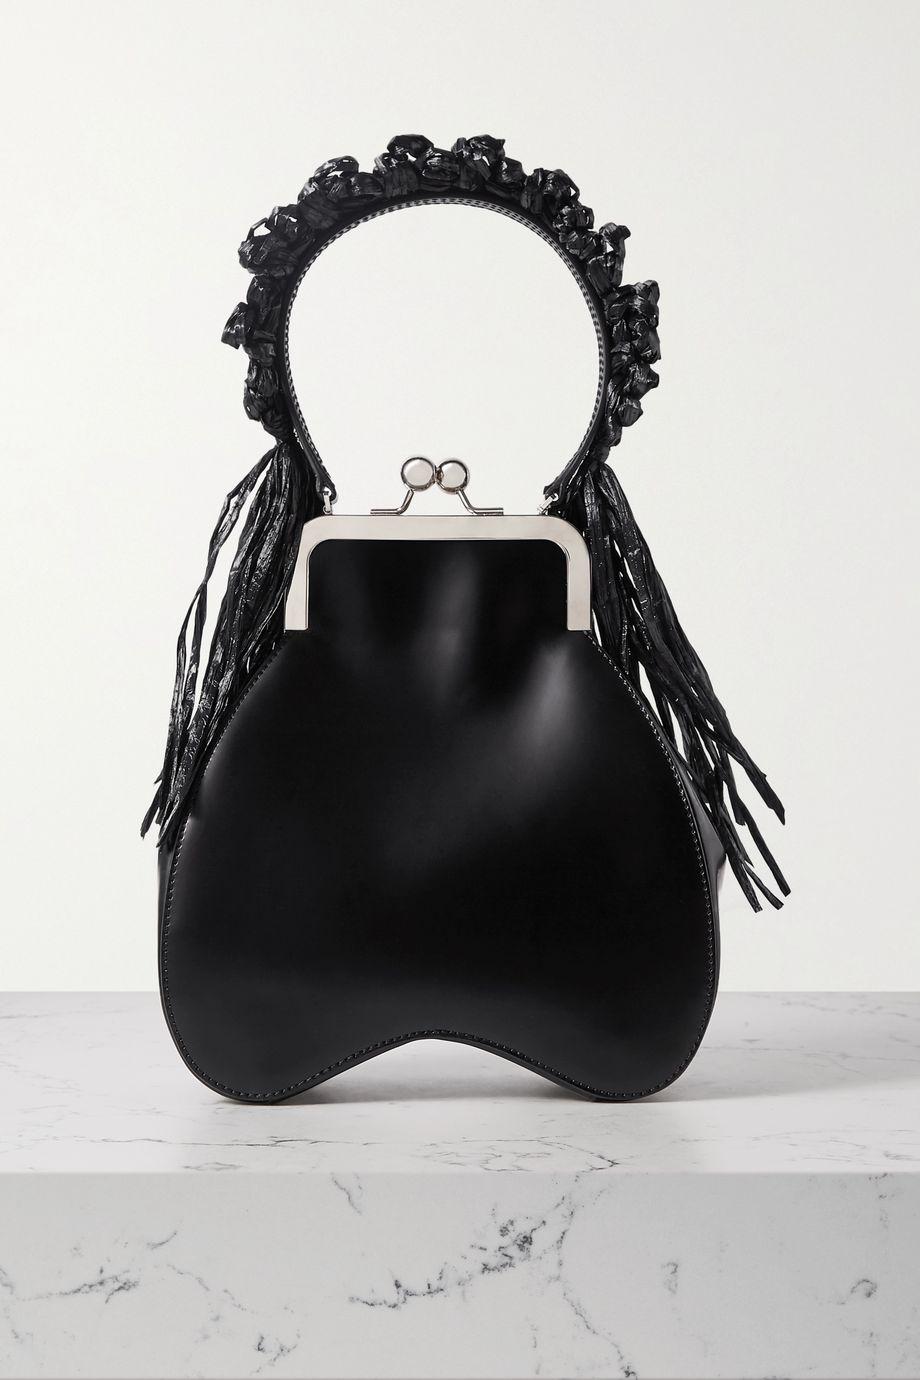 Simone Rocha Bead-embellished tasseled raffia and leather tote